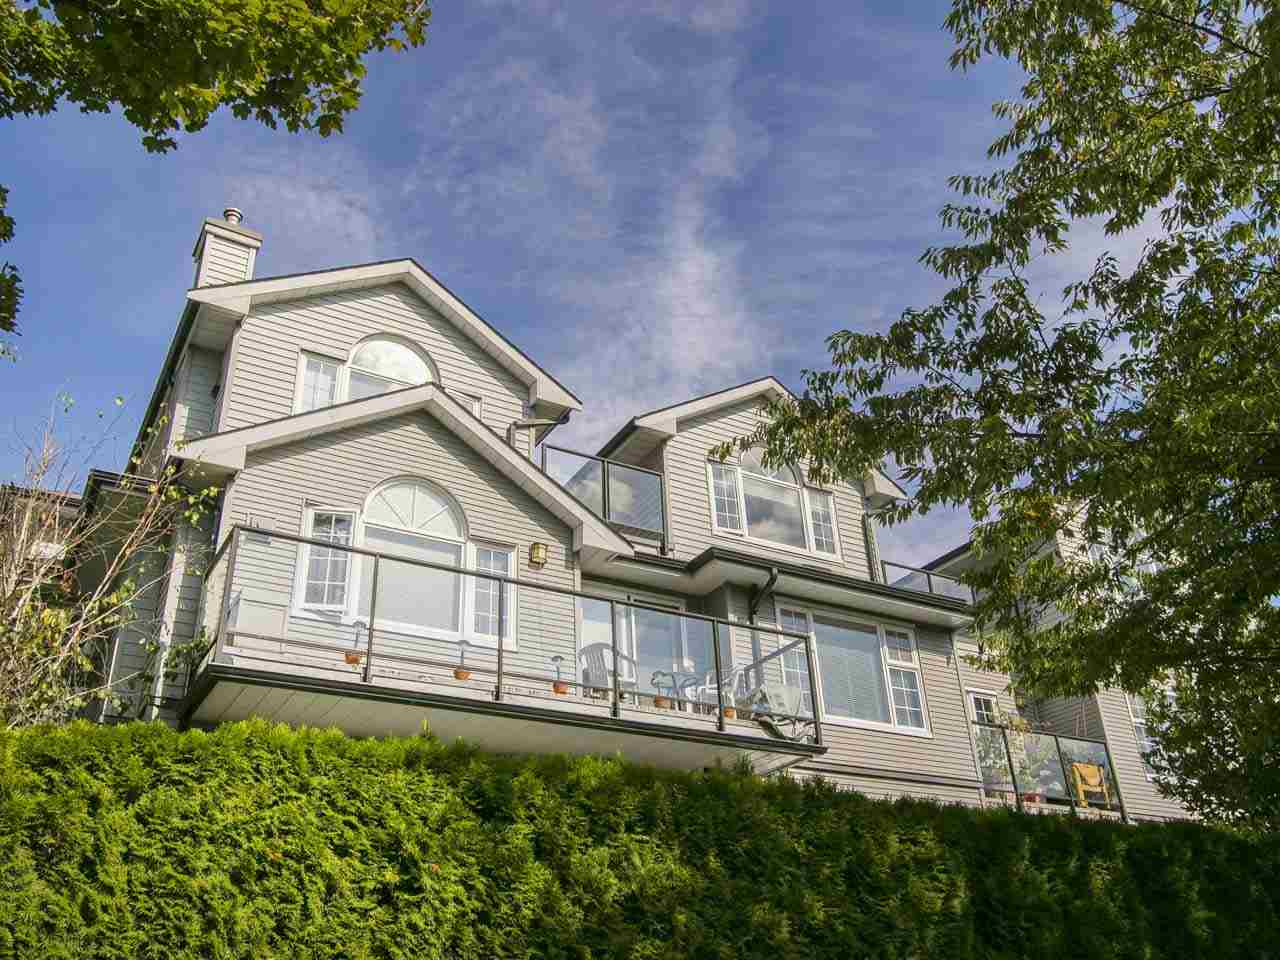 306 833 W 16TH AVENUE, Vancouver, BC, V5Z 1S9 Primary Photo